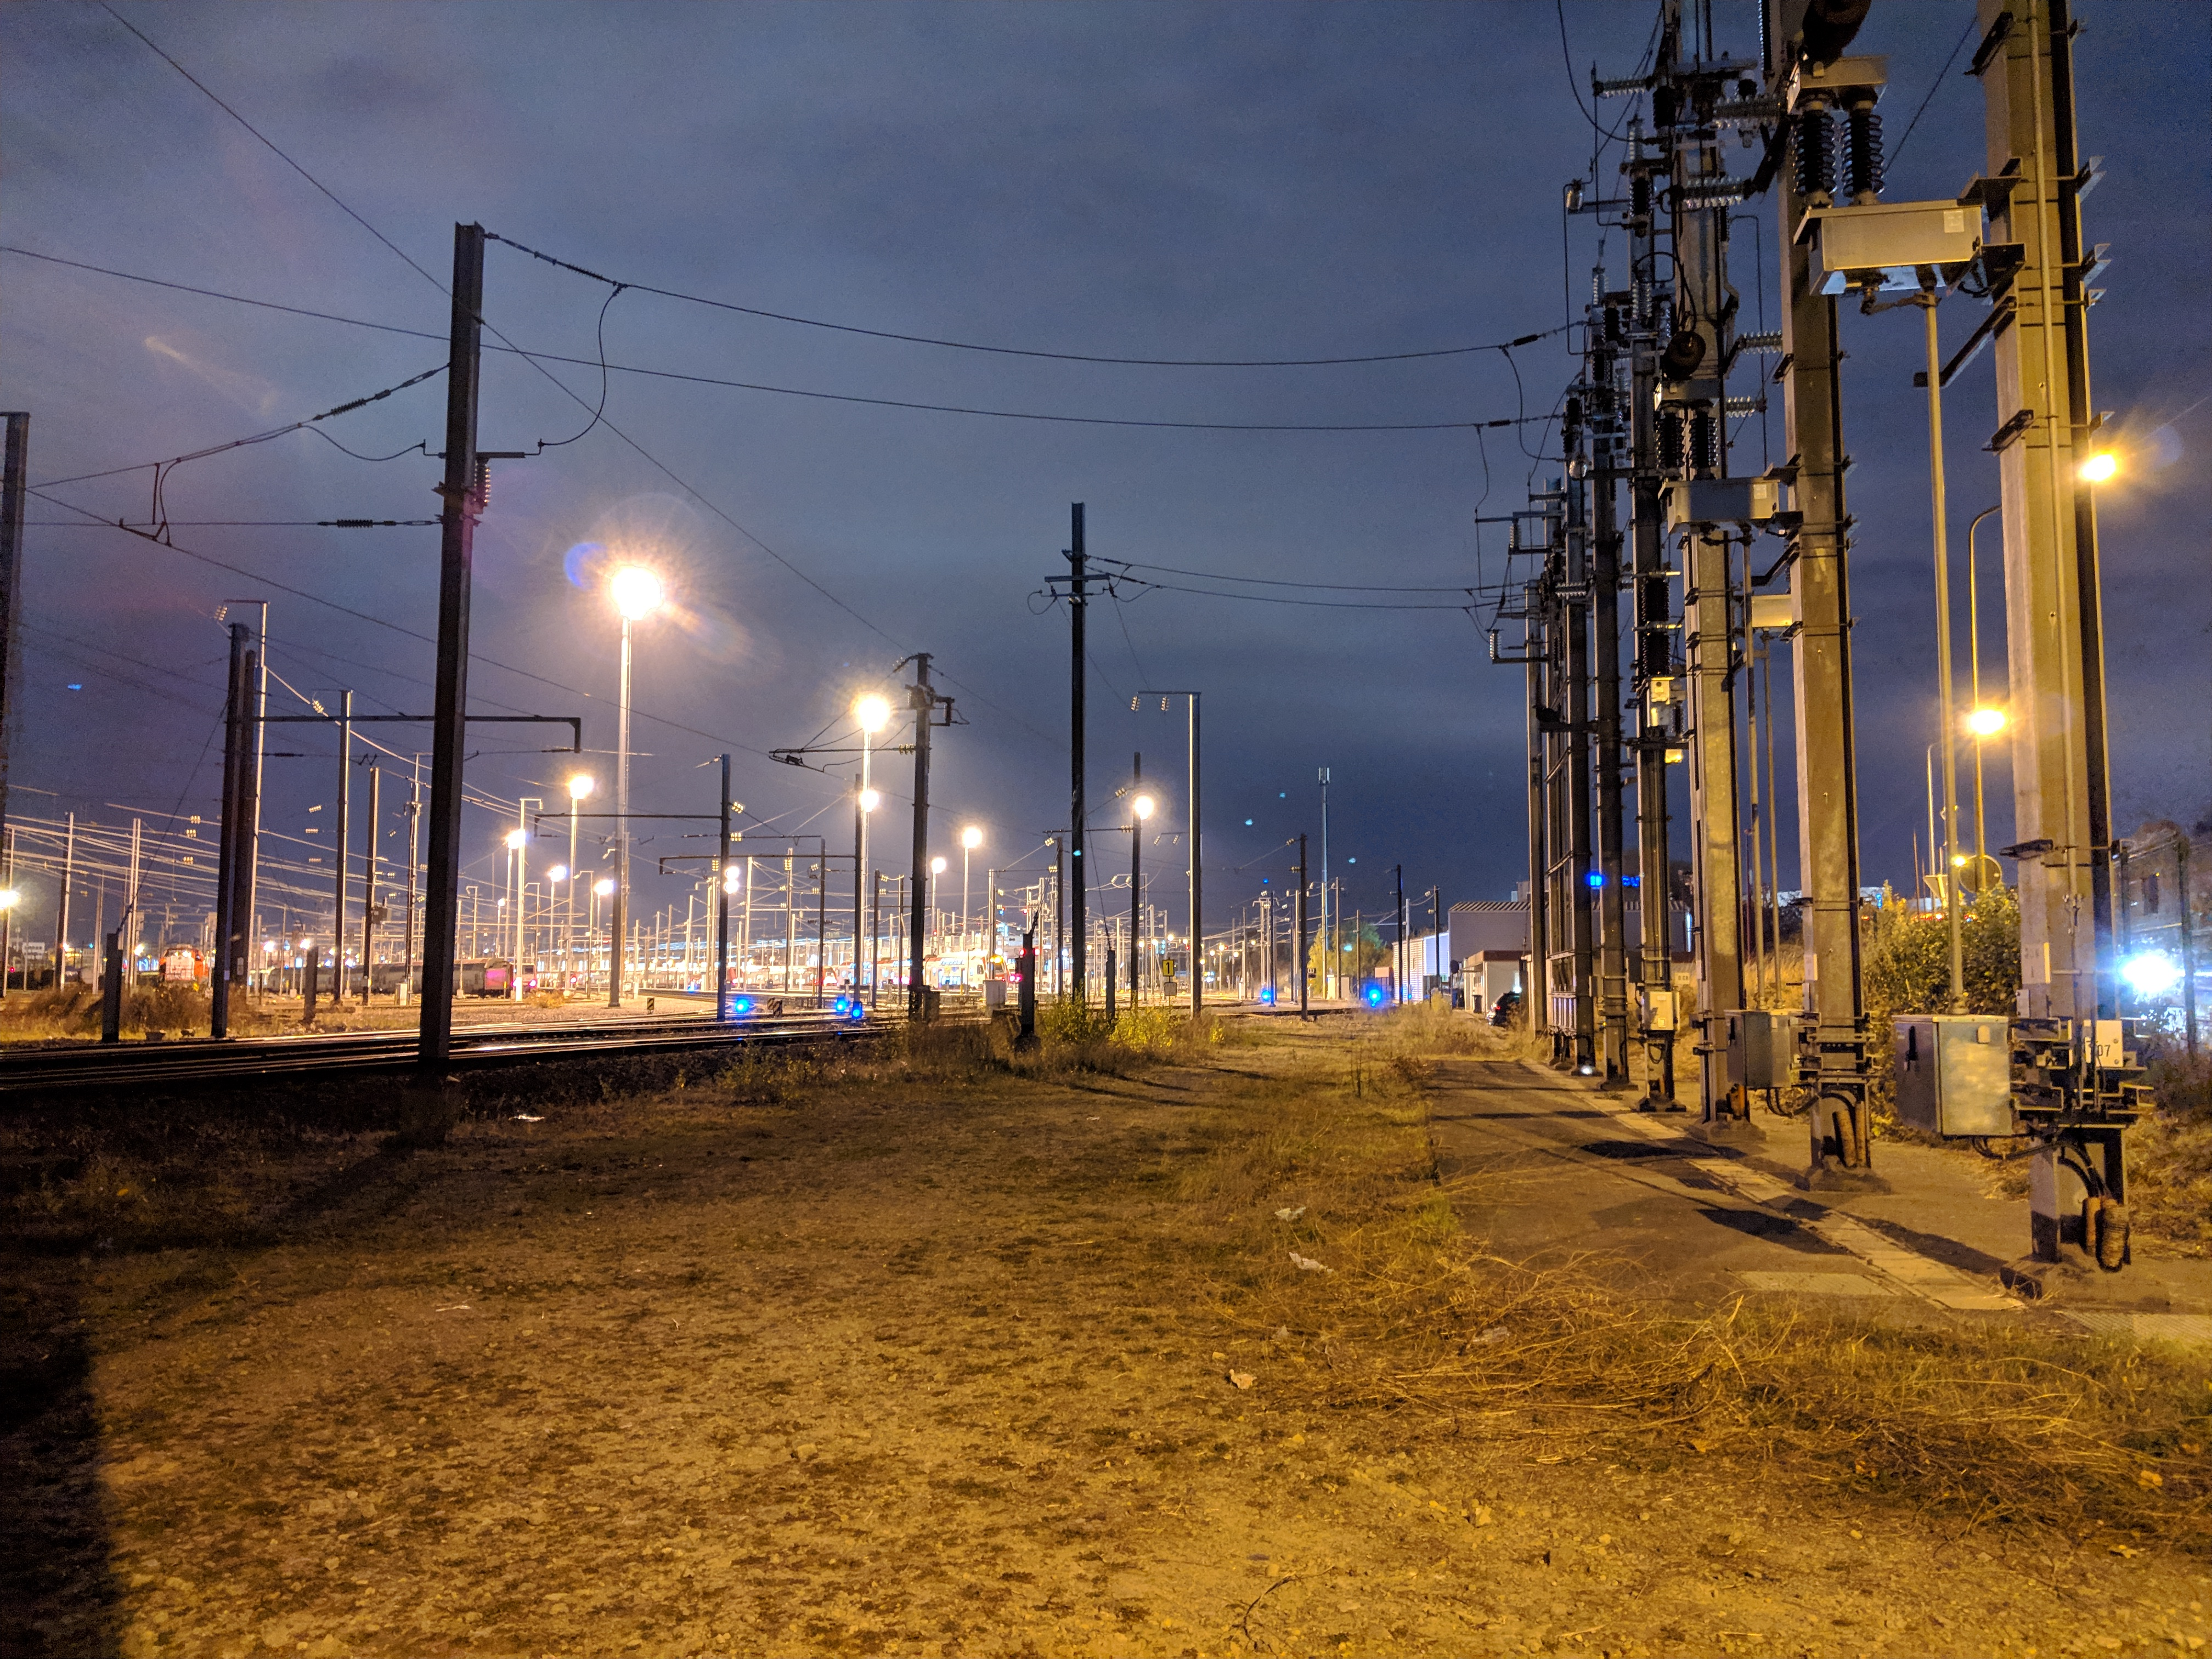 Camera - Low Light Evaluation - Night Sight - The Google